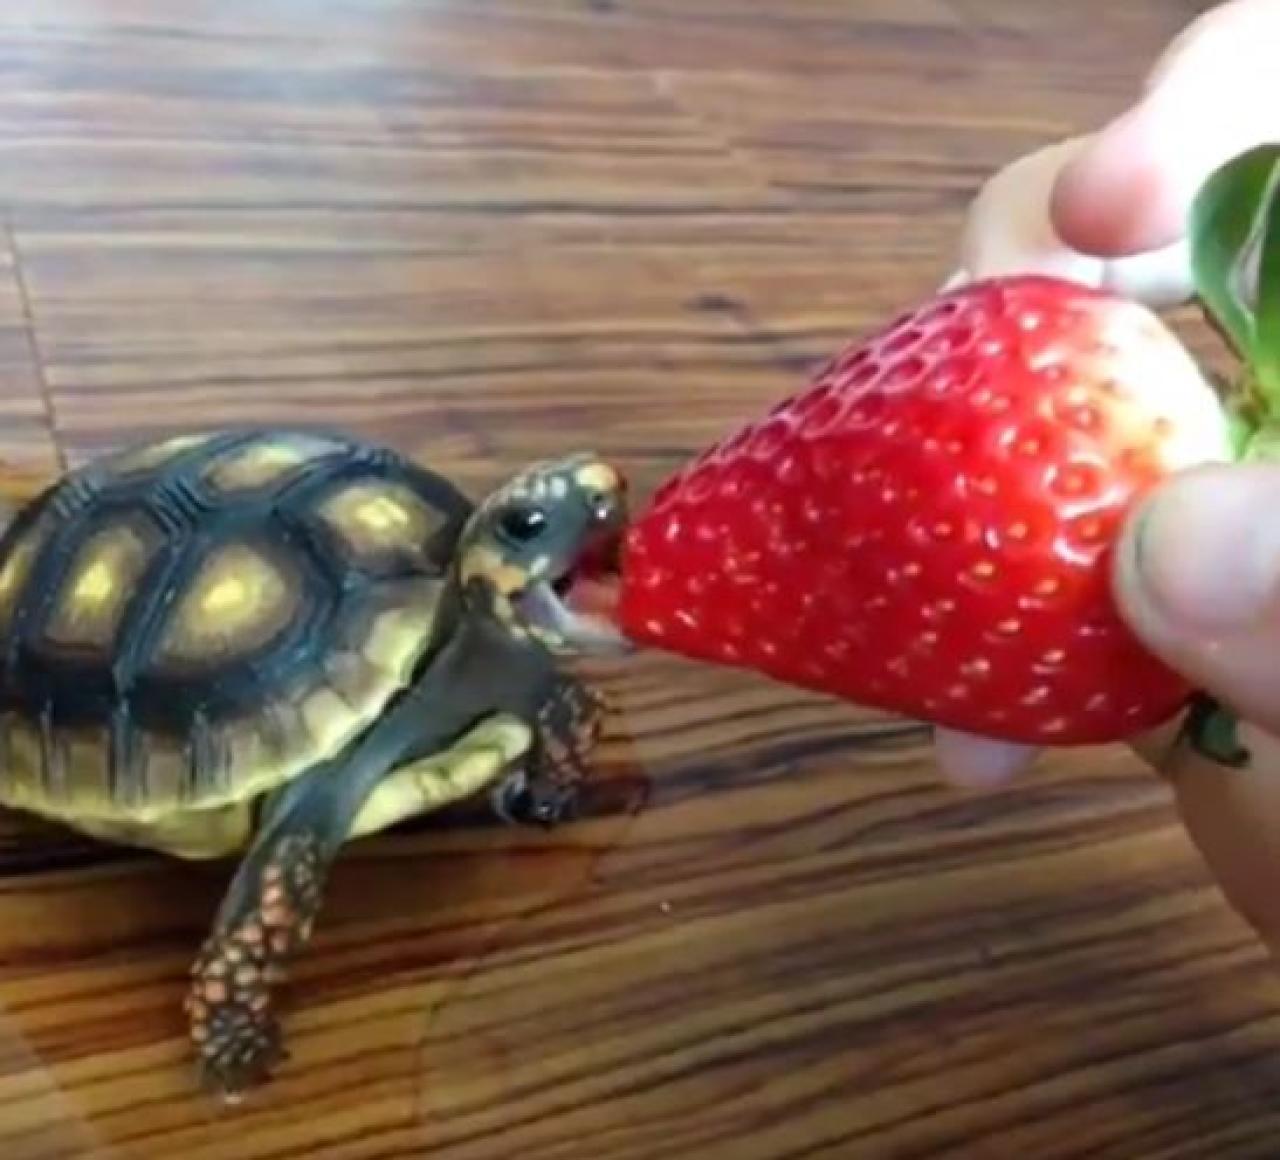 Kleine Schildkröte  grooo�e Erdbeere